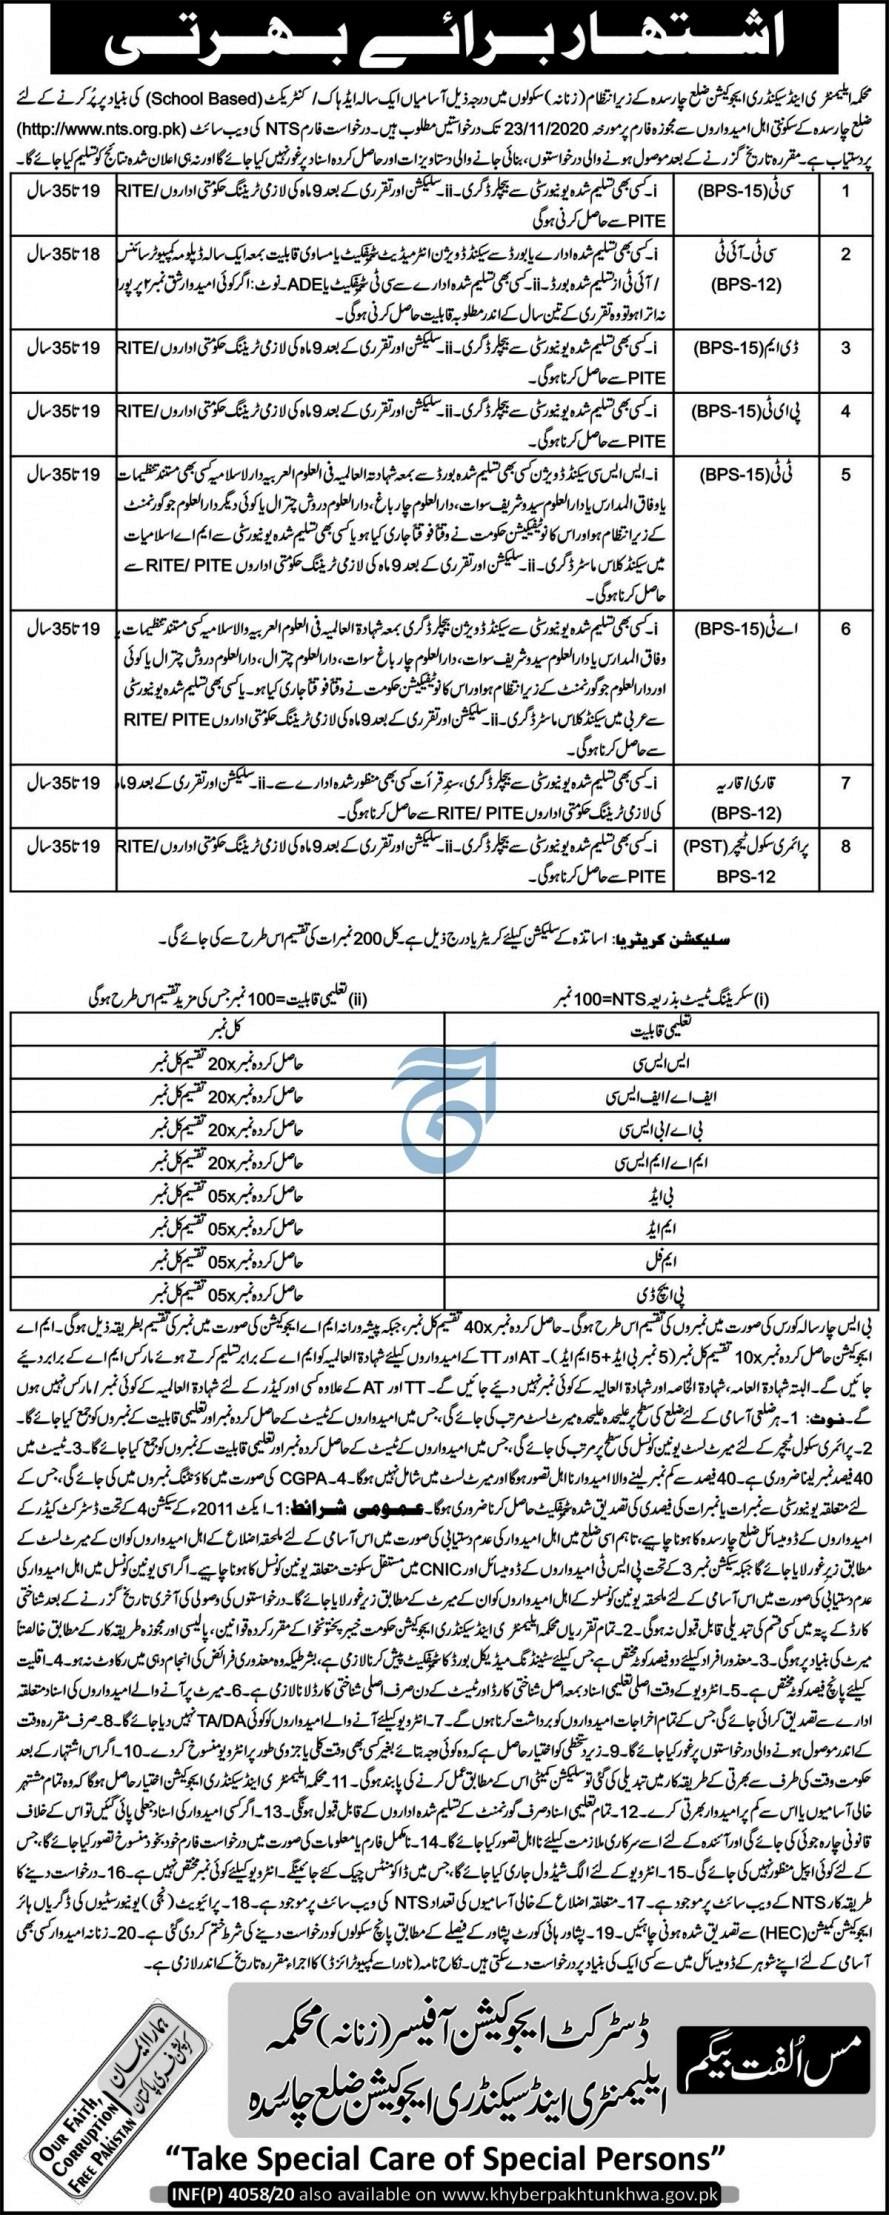 Govt Teacher Job in KPK   Latest Teaching Vacancies in KPK   Teaching Jobs in Peshawar